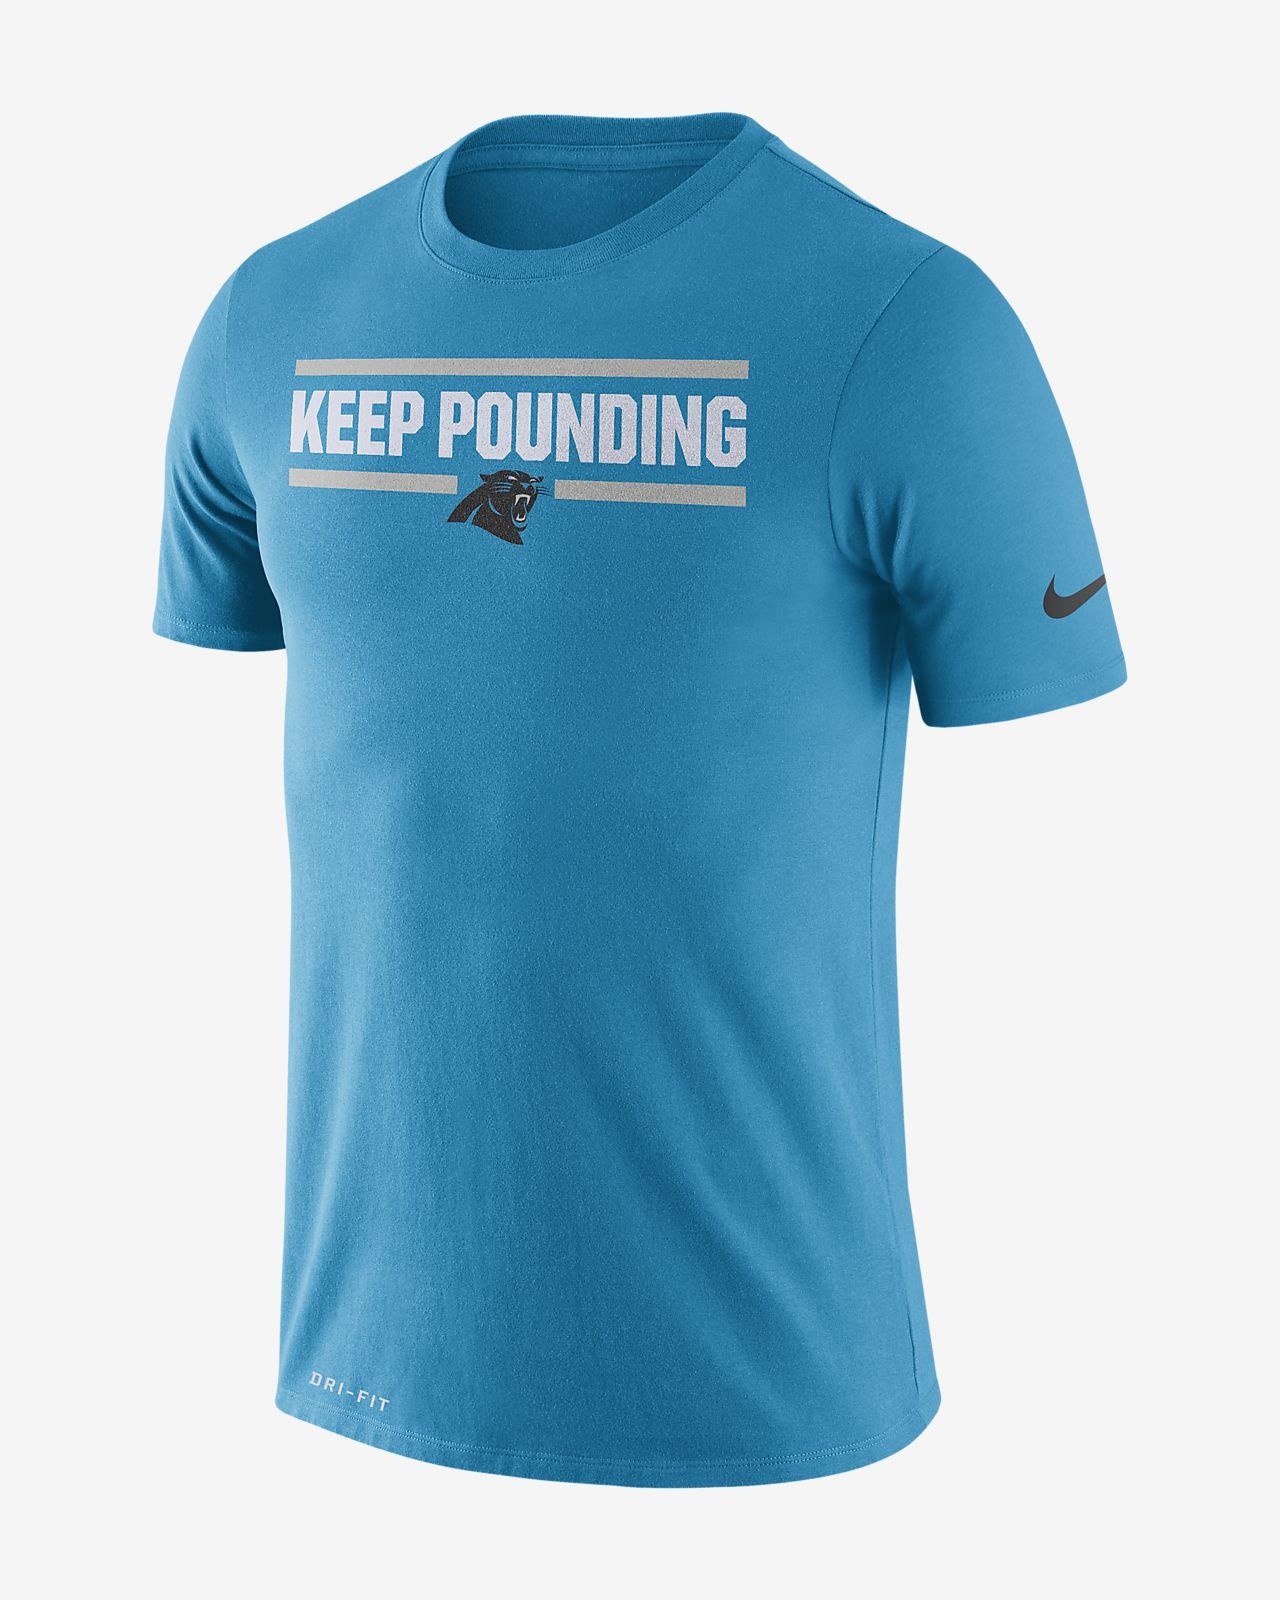 Nike Dri-FIT Local (NFL Panthers) Men's T-Shirt